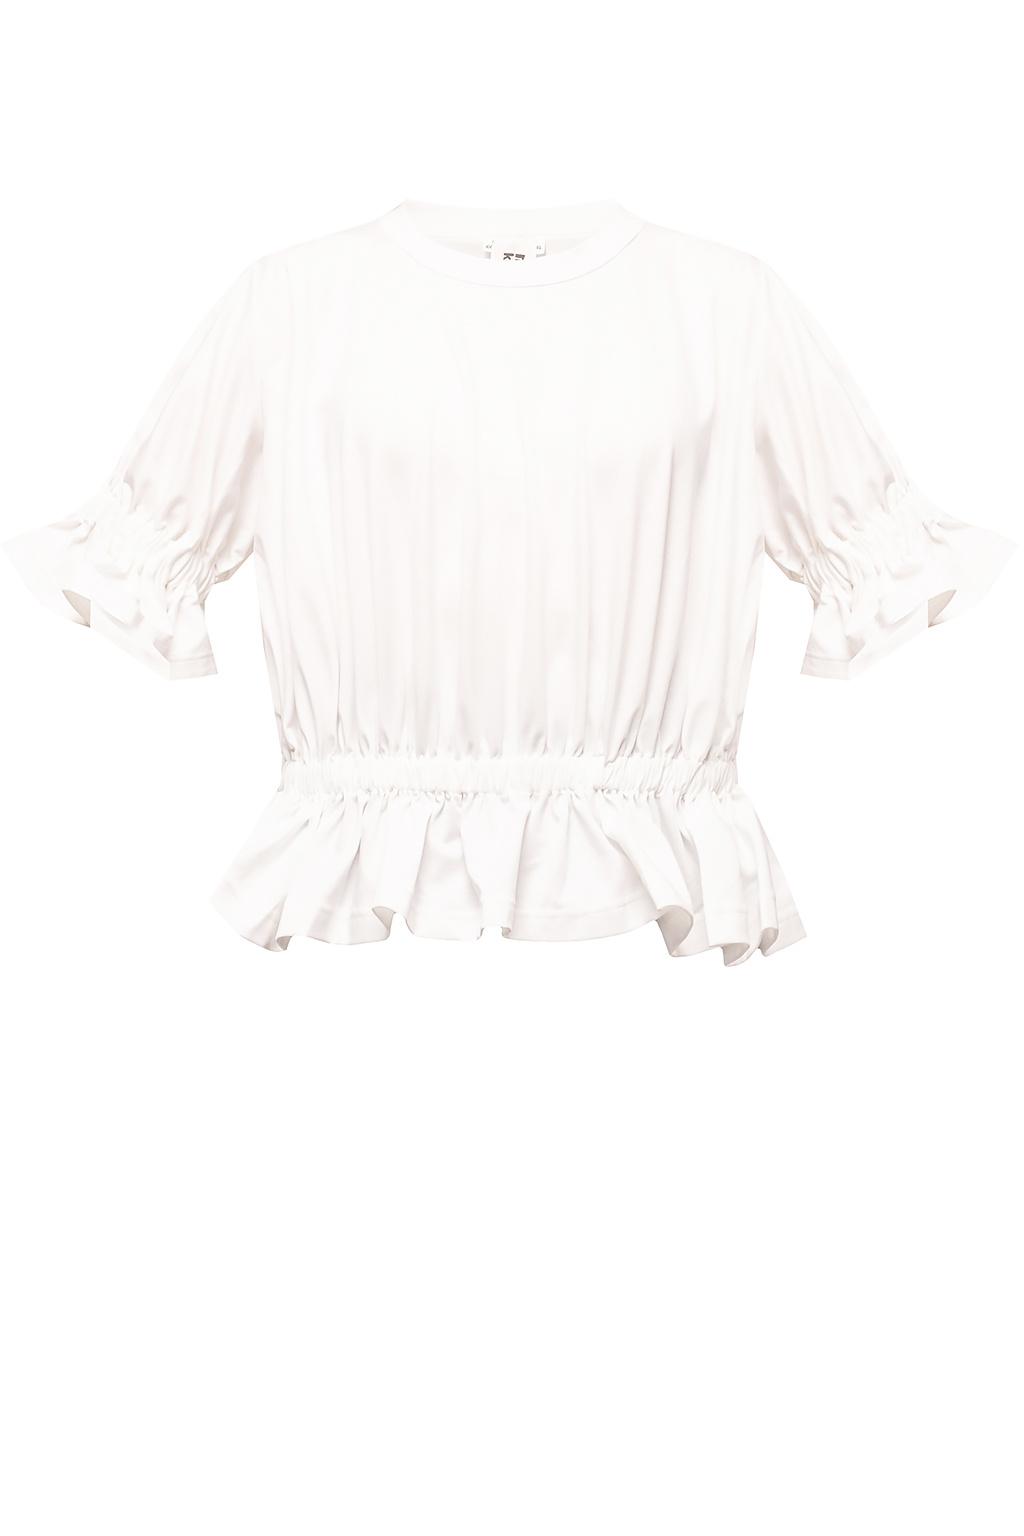 Comme des Garcons Ninomiya Ruffled T-shirt